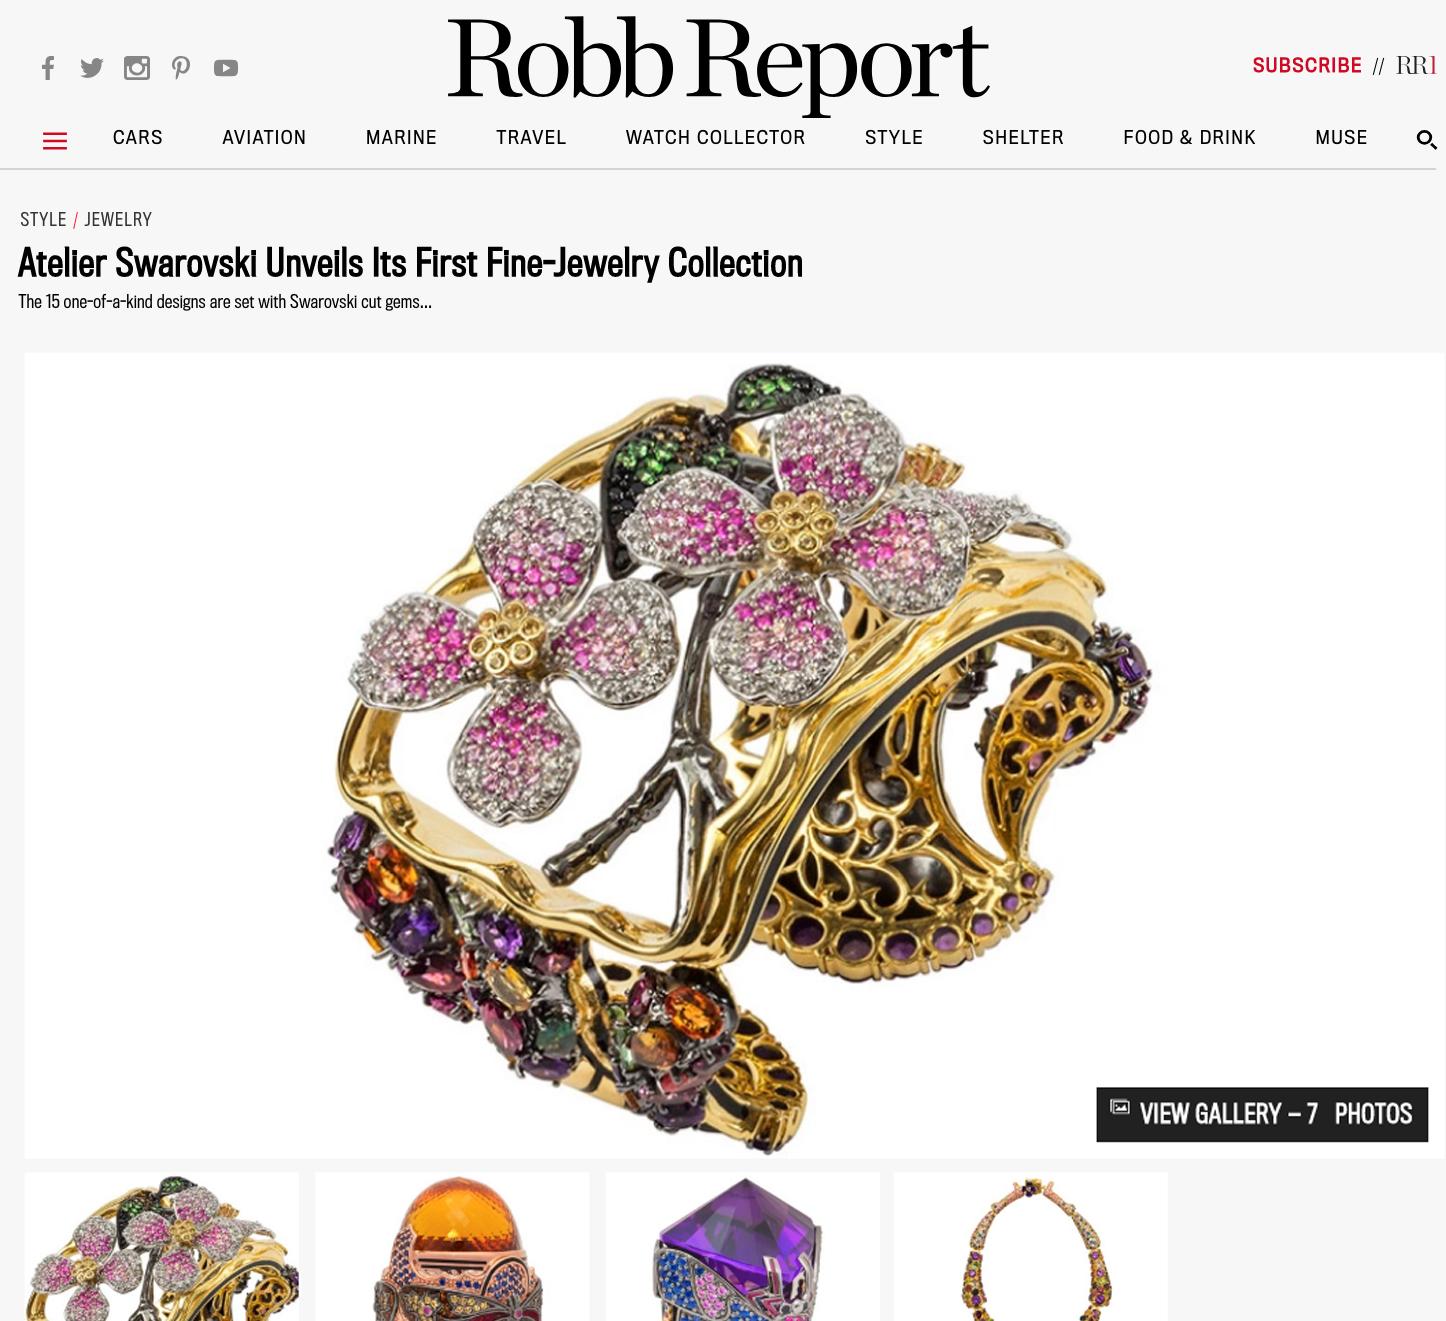 ROBB REPORT - Atelier Swarovski Unveils Its First Fine-Jewelry Collection